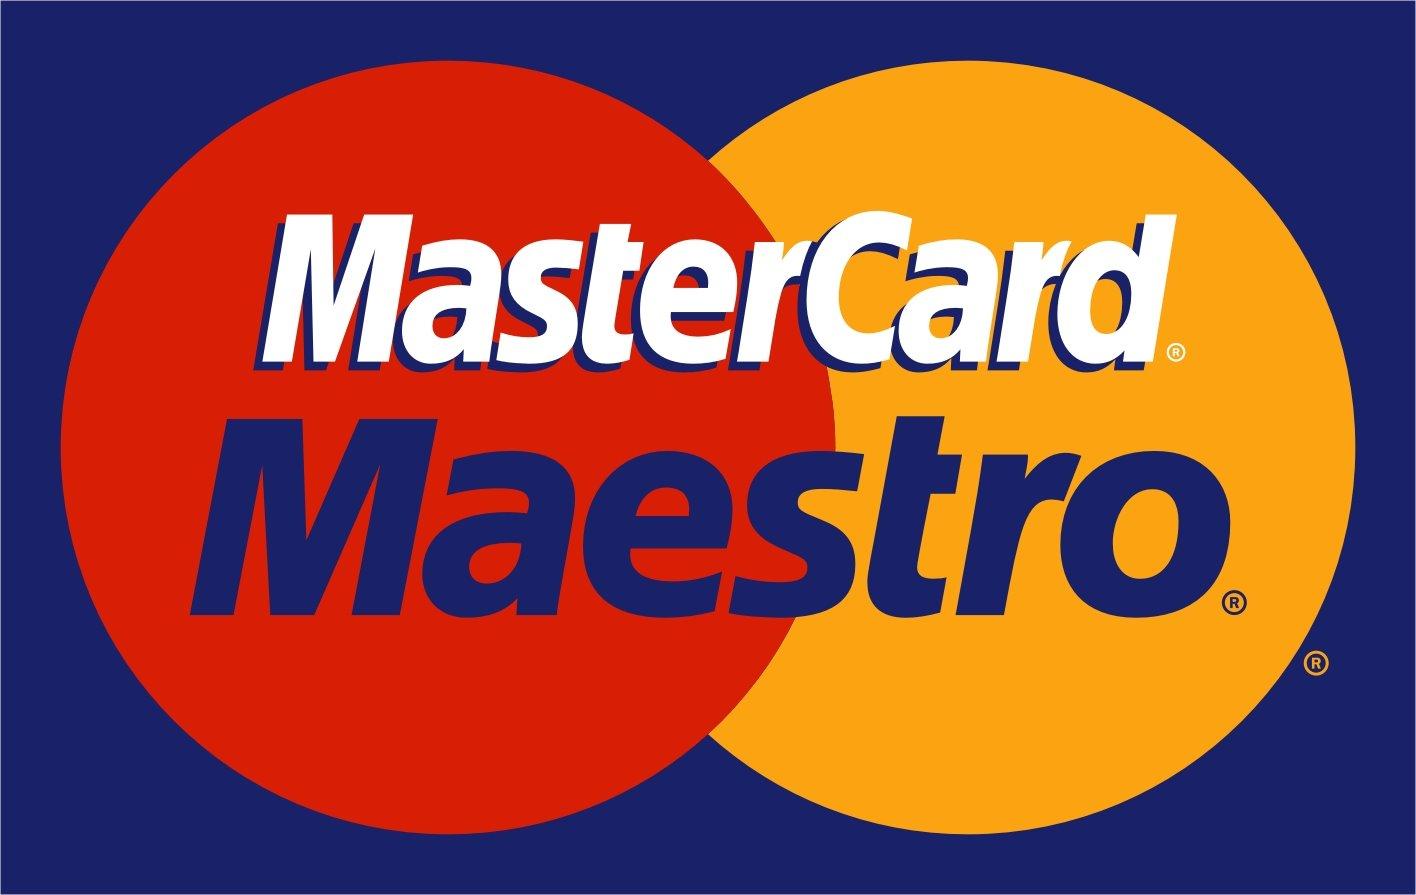 Maestro = Mastercard